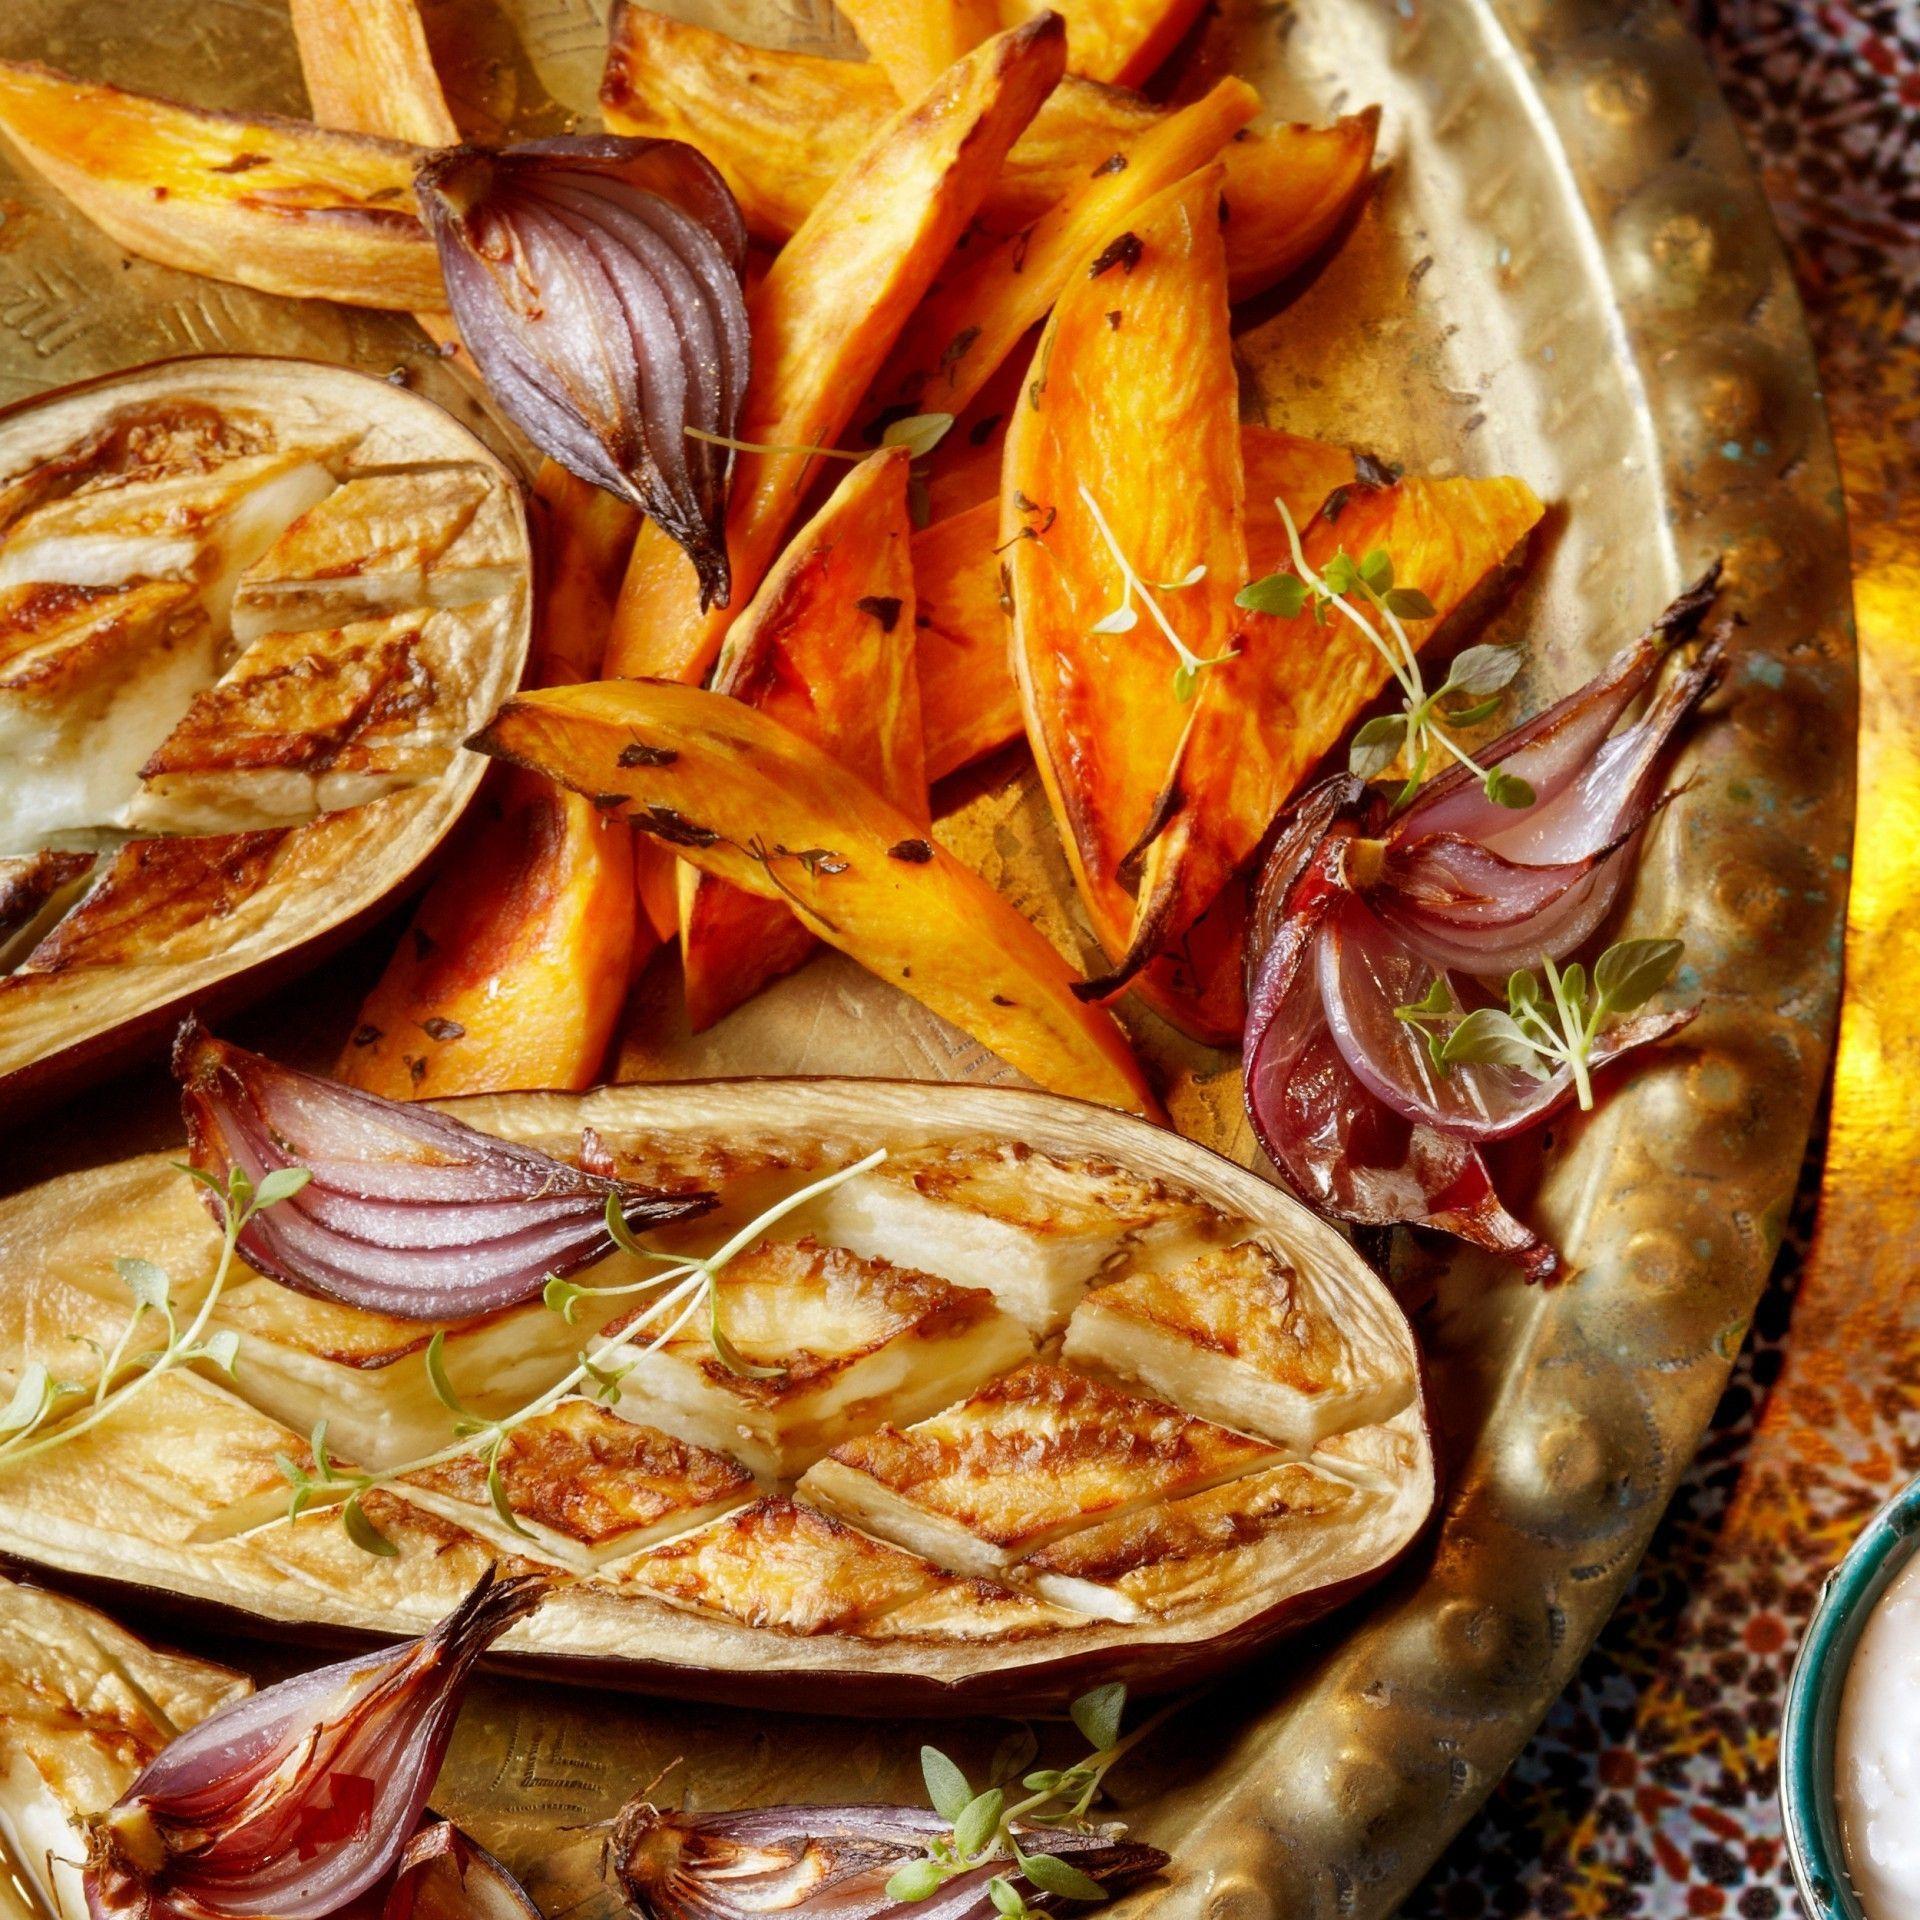 Geröstete aubergine mit köfte     #kartoffeleckenrezept Geröstete aubergine mit köfte      #tagrezepte #rezept #rezepte #essen #kochen #kuchen #recipeguide #recipe #food #foodlovers #foodrecipes #instafood #hungry #foodpic #foodporn #instarecipes #kartoffeleckenrezept